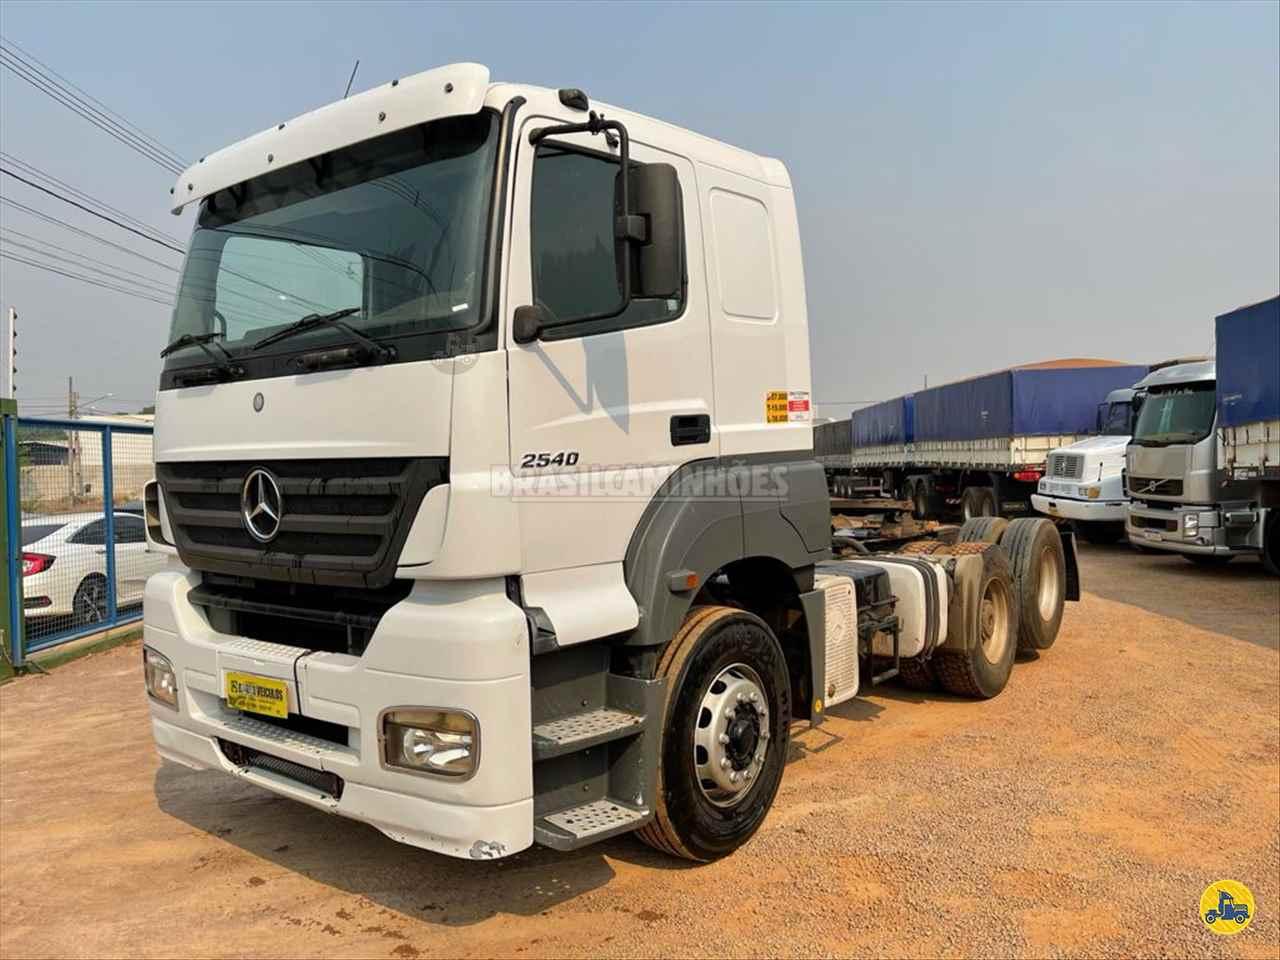 MB 2540 de Brasil Caminhões Sinop - SINOP/MT